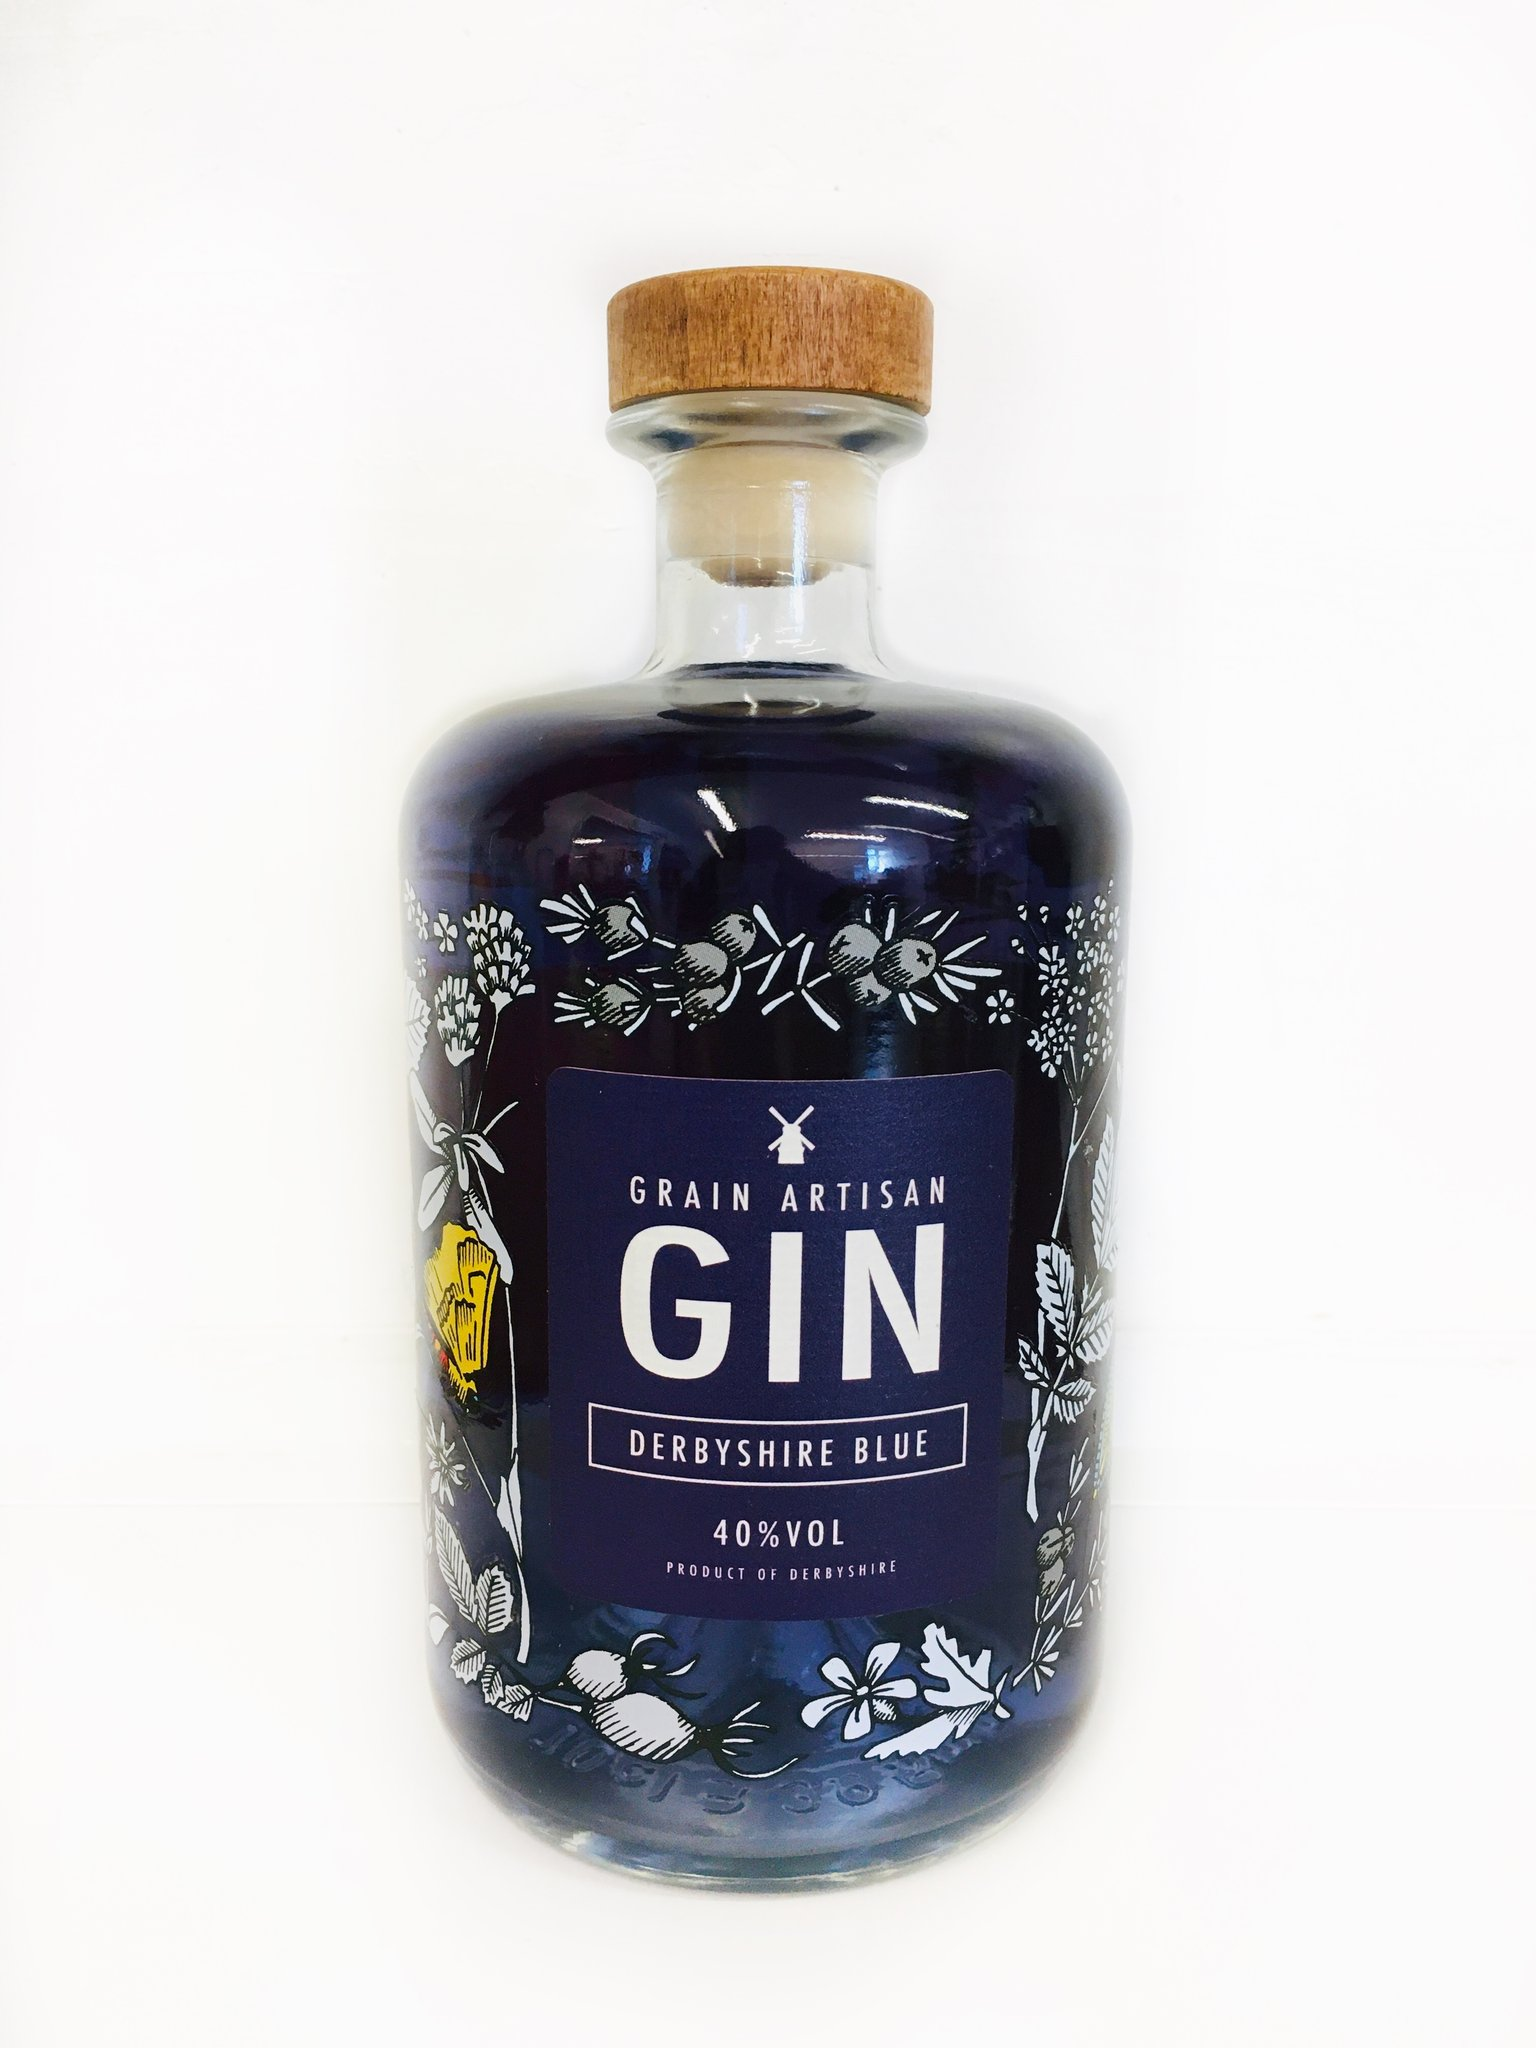 Grain Artisan Derbyshire Blue Gin 20cl